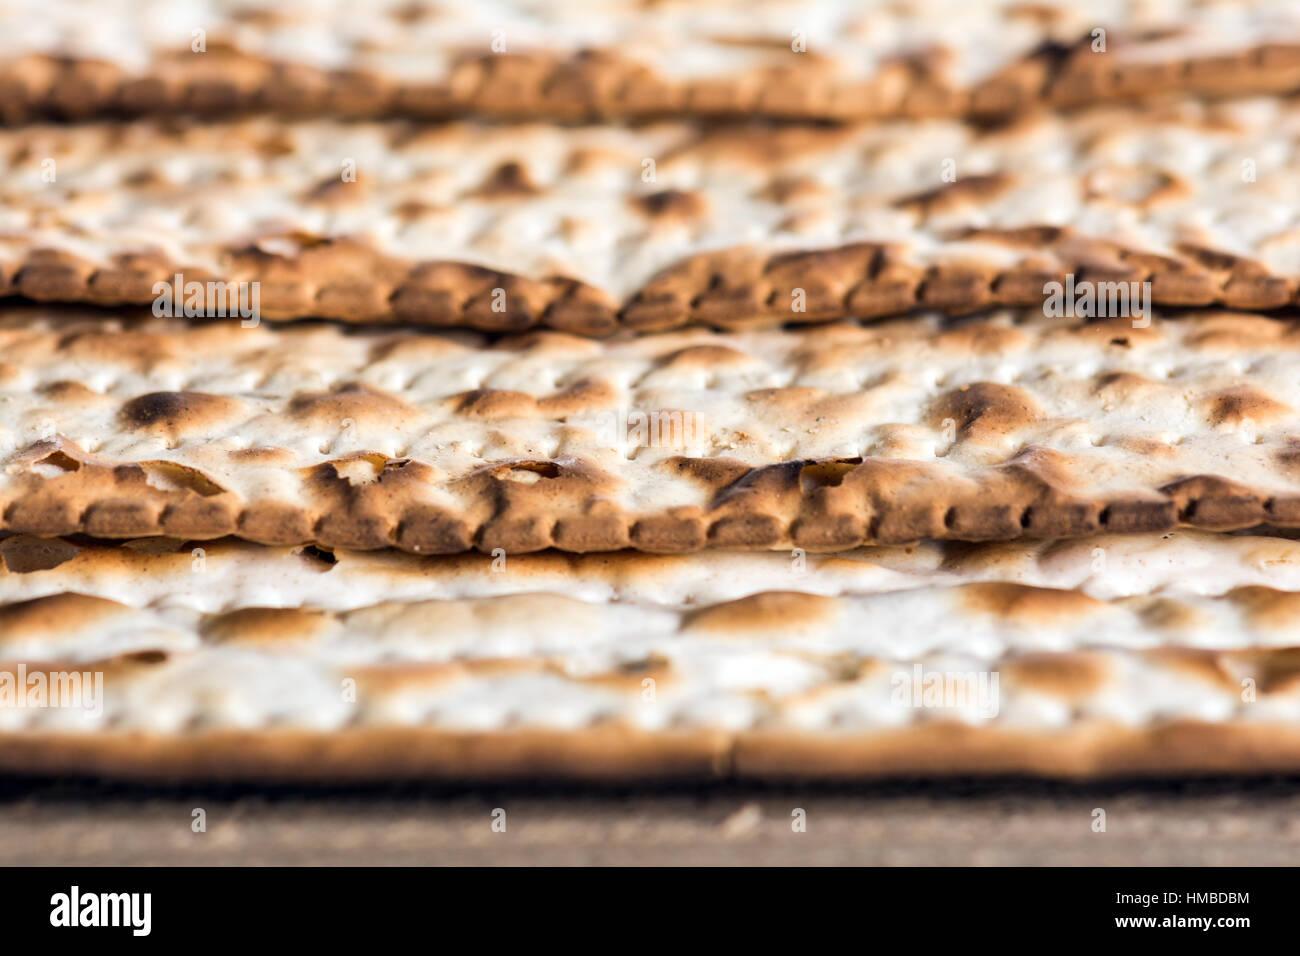 Jewish Matza On Passover stock photo 641204948 | iStock